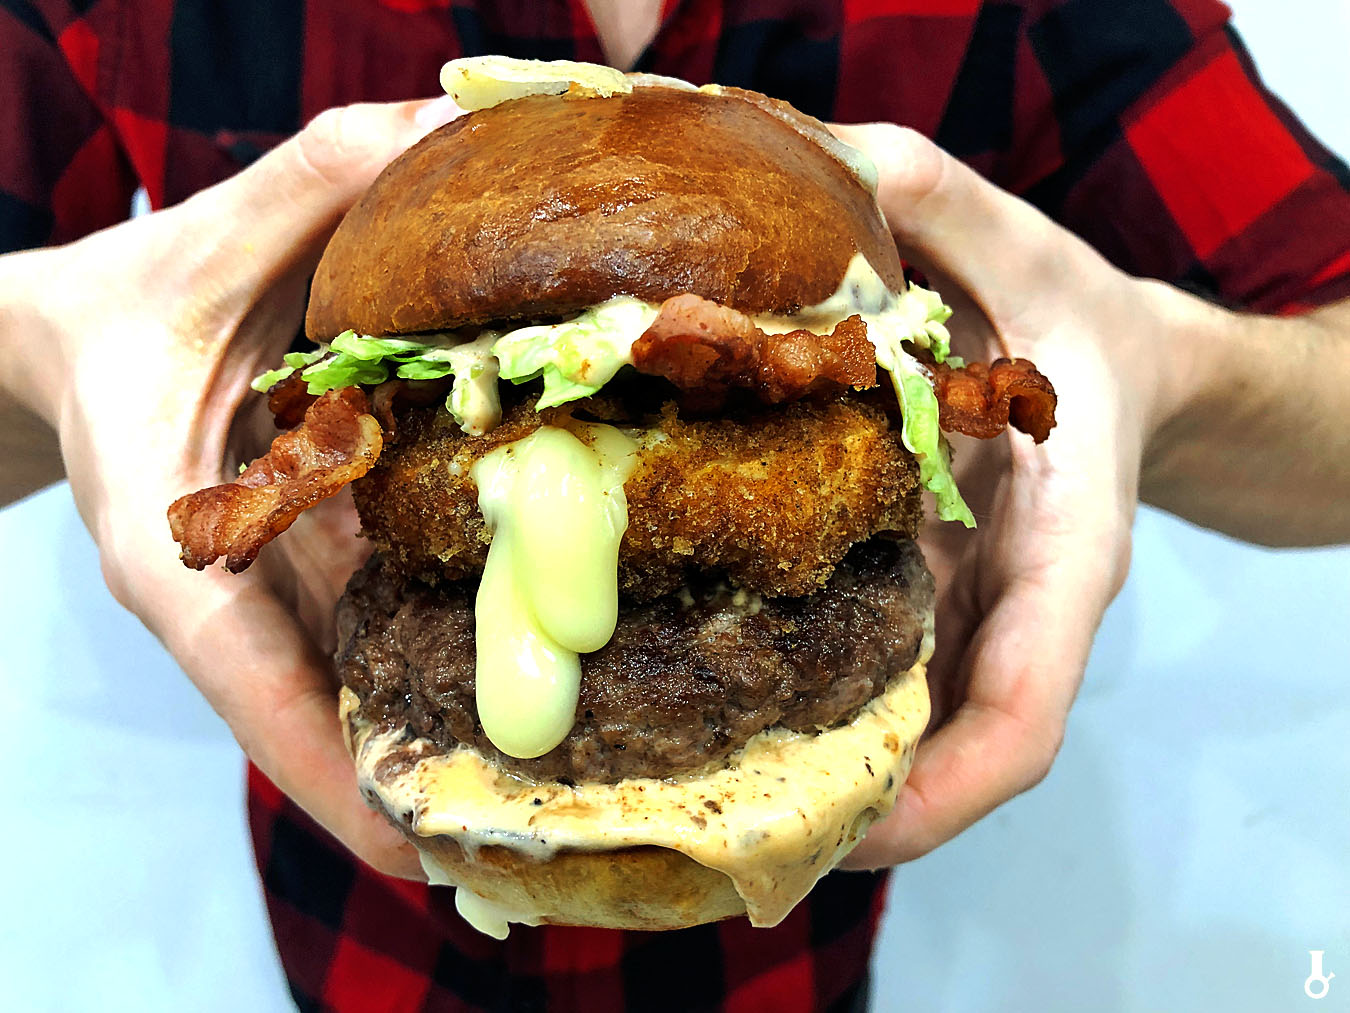 https://www.stonerchef.pl/wp-content/uploads/2019/01/burger-drwala.jpg